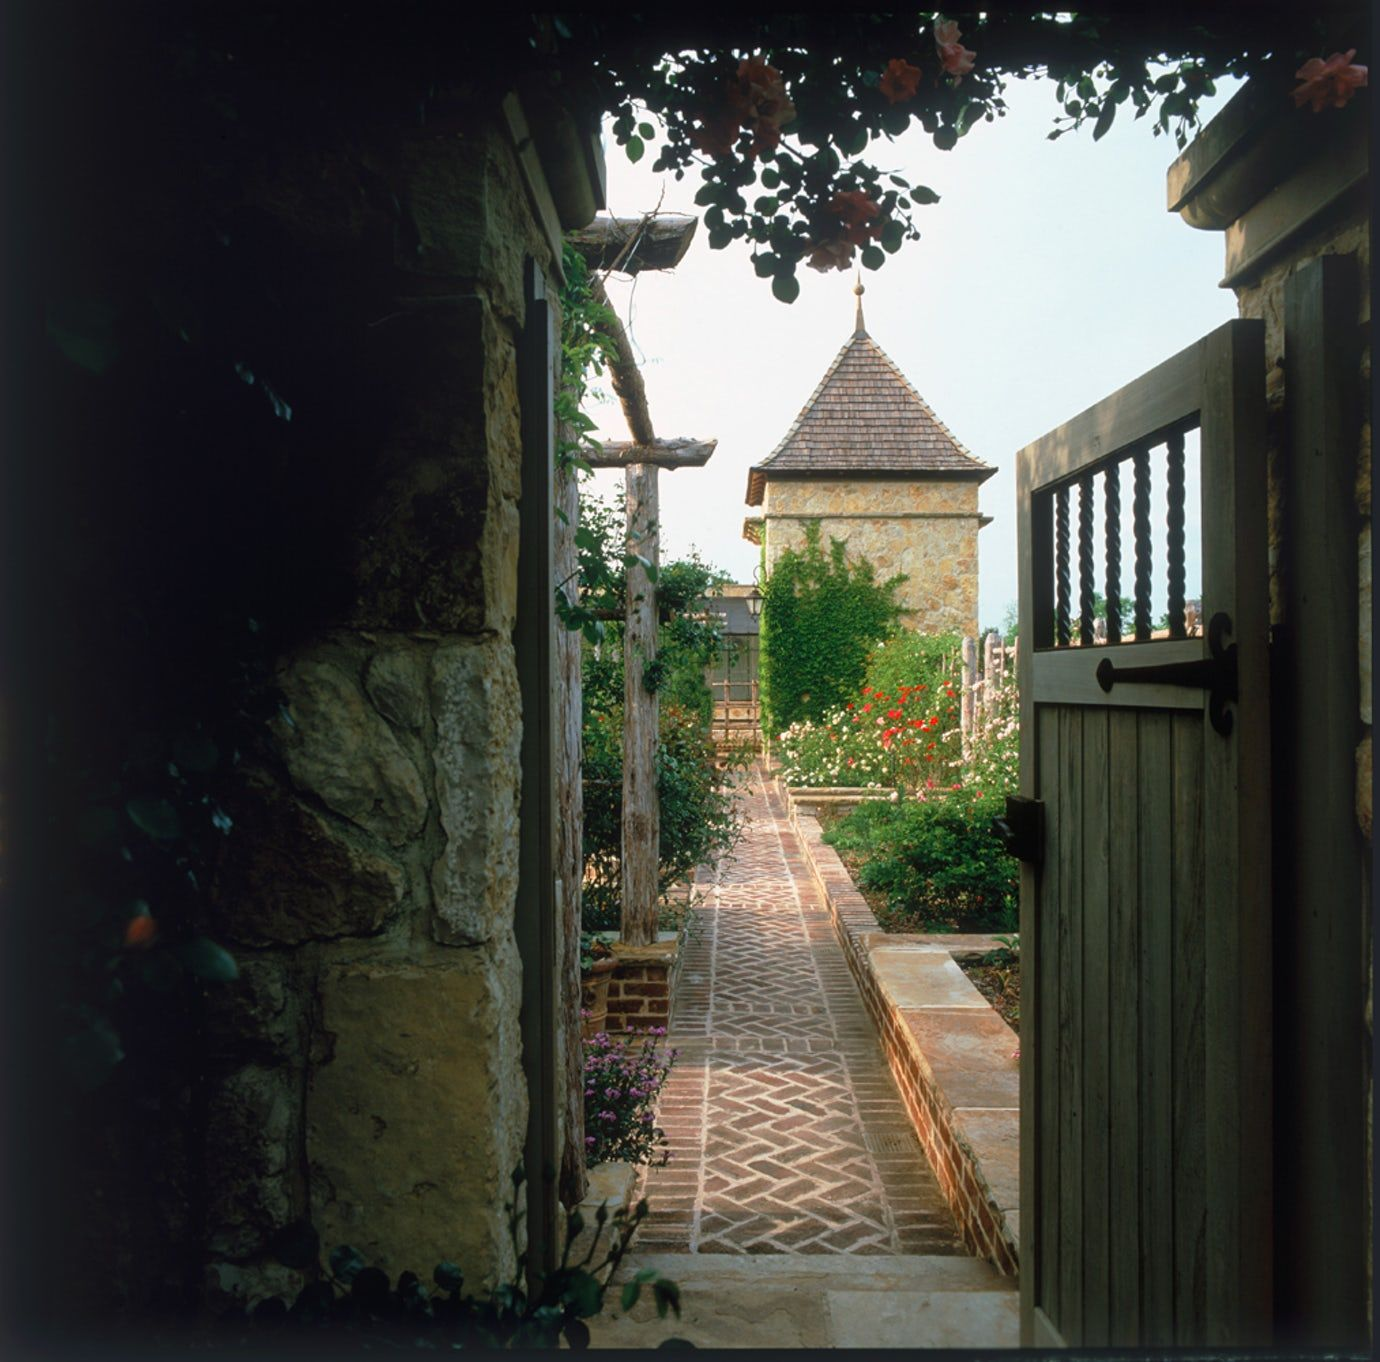 French Country Garden Design Layout: A New Country French Garden Rustic Mediterranean Garden